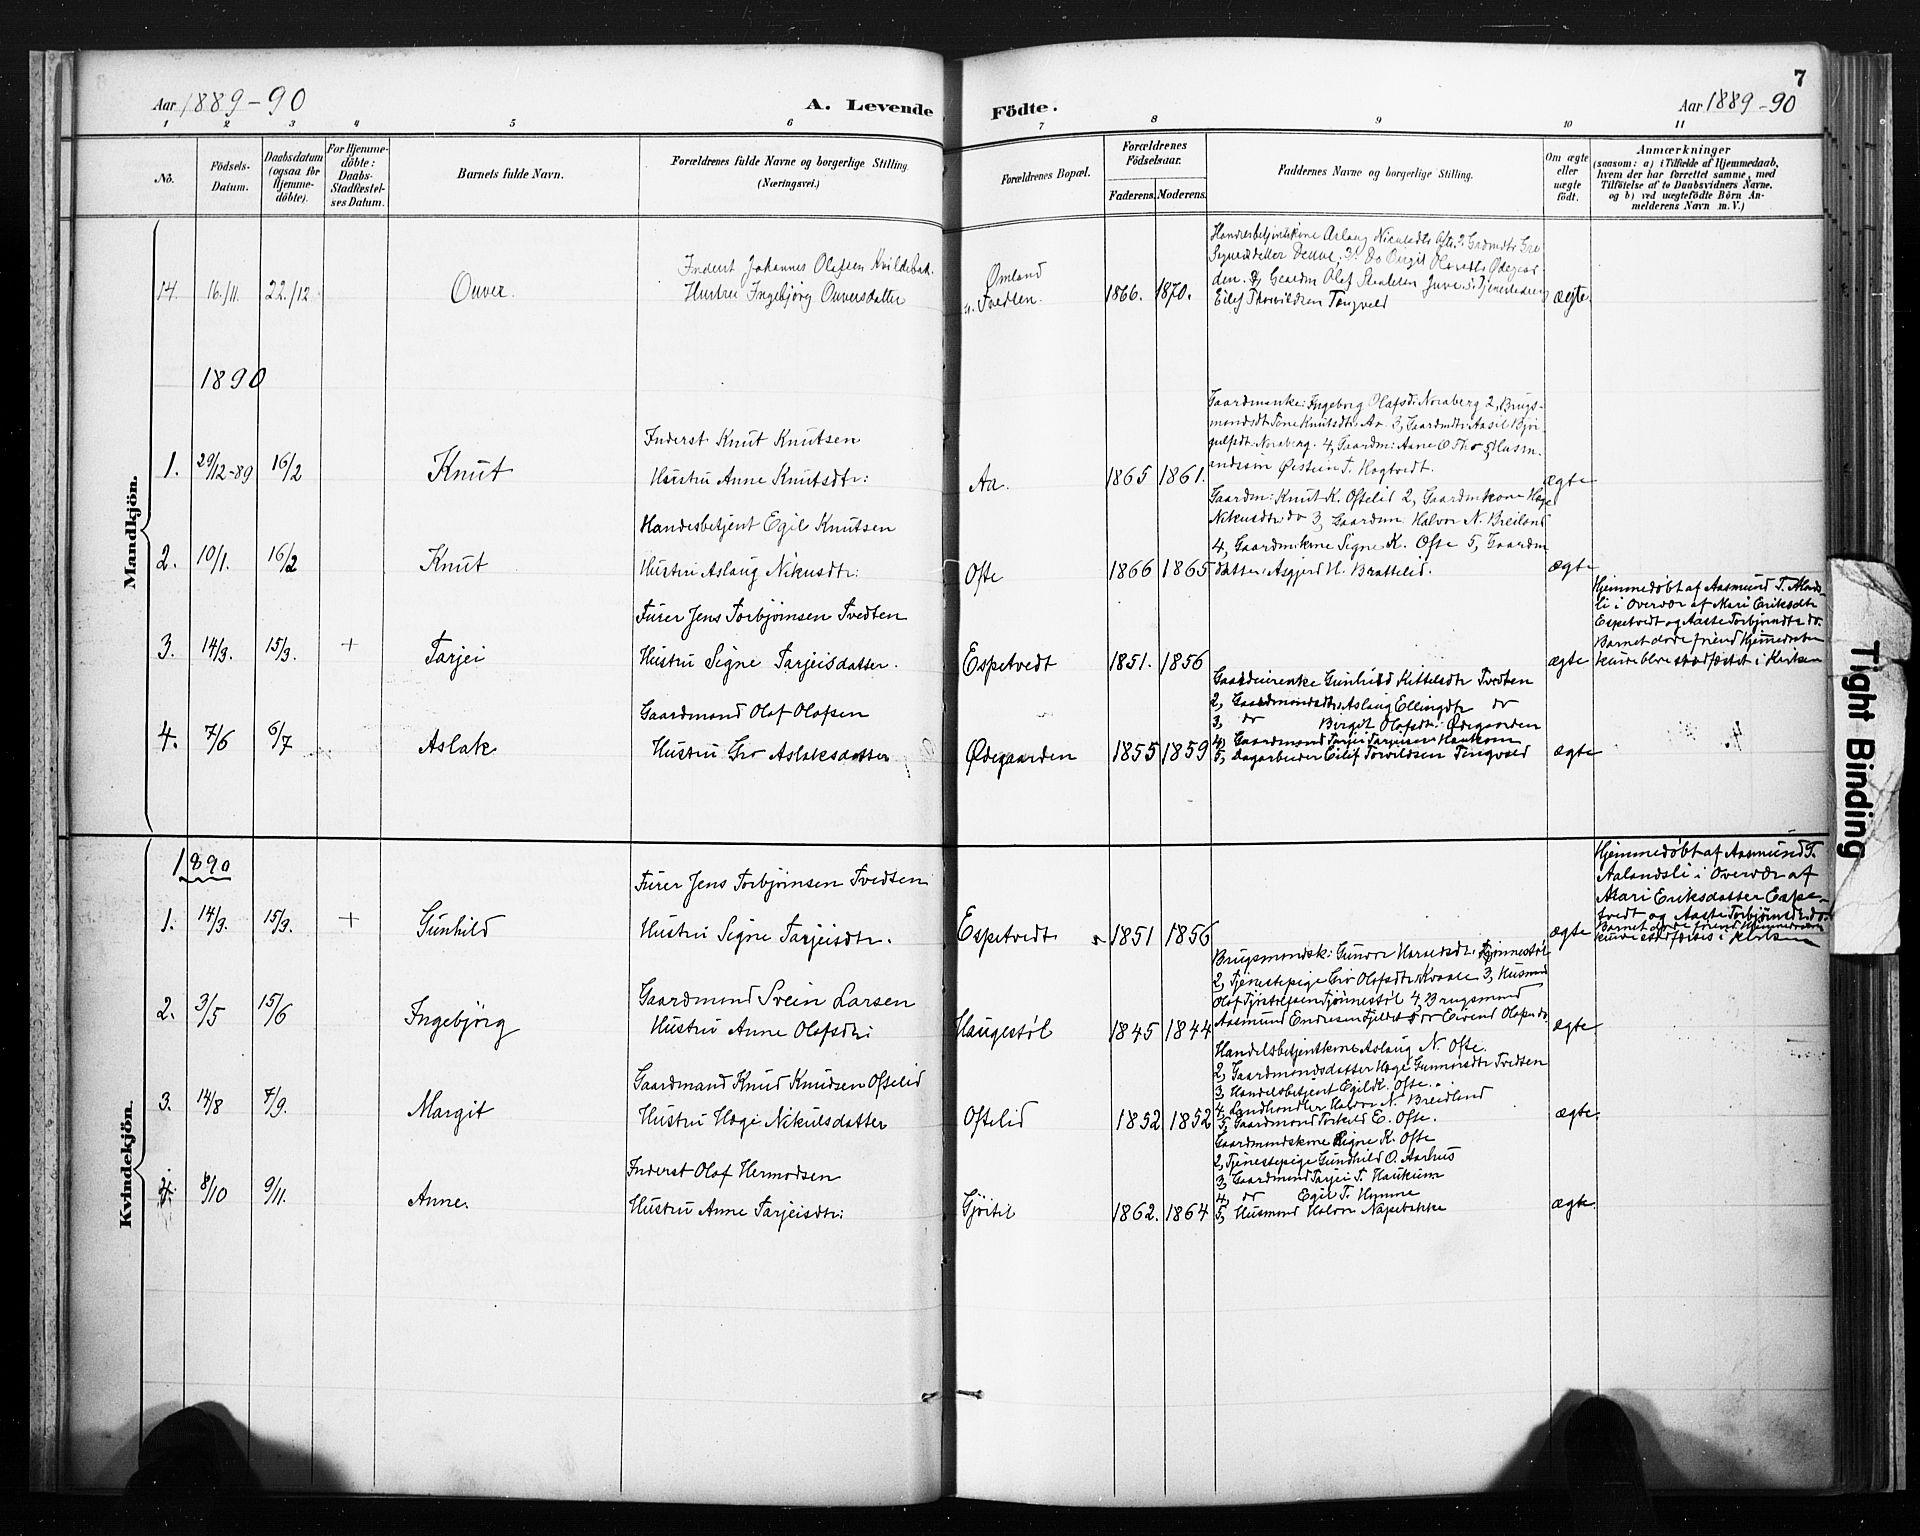 SAKO, Lårdal kirkebøker, F/Fc/L0002: Ministerialbok nr. III 2, 1887-1906, s. 7